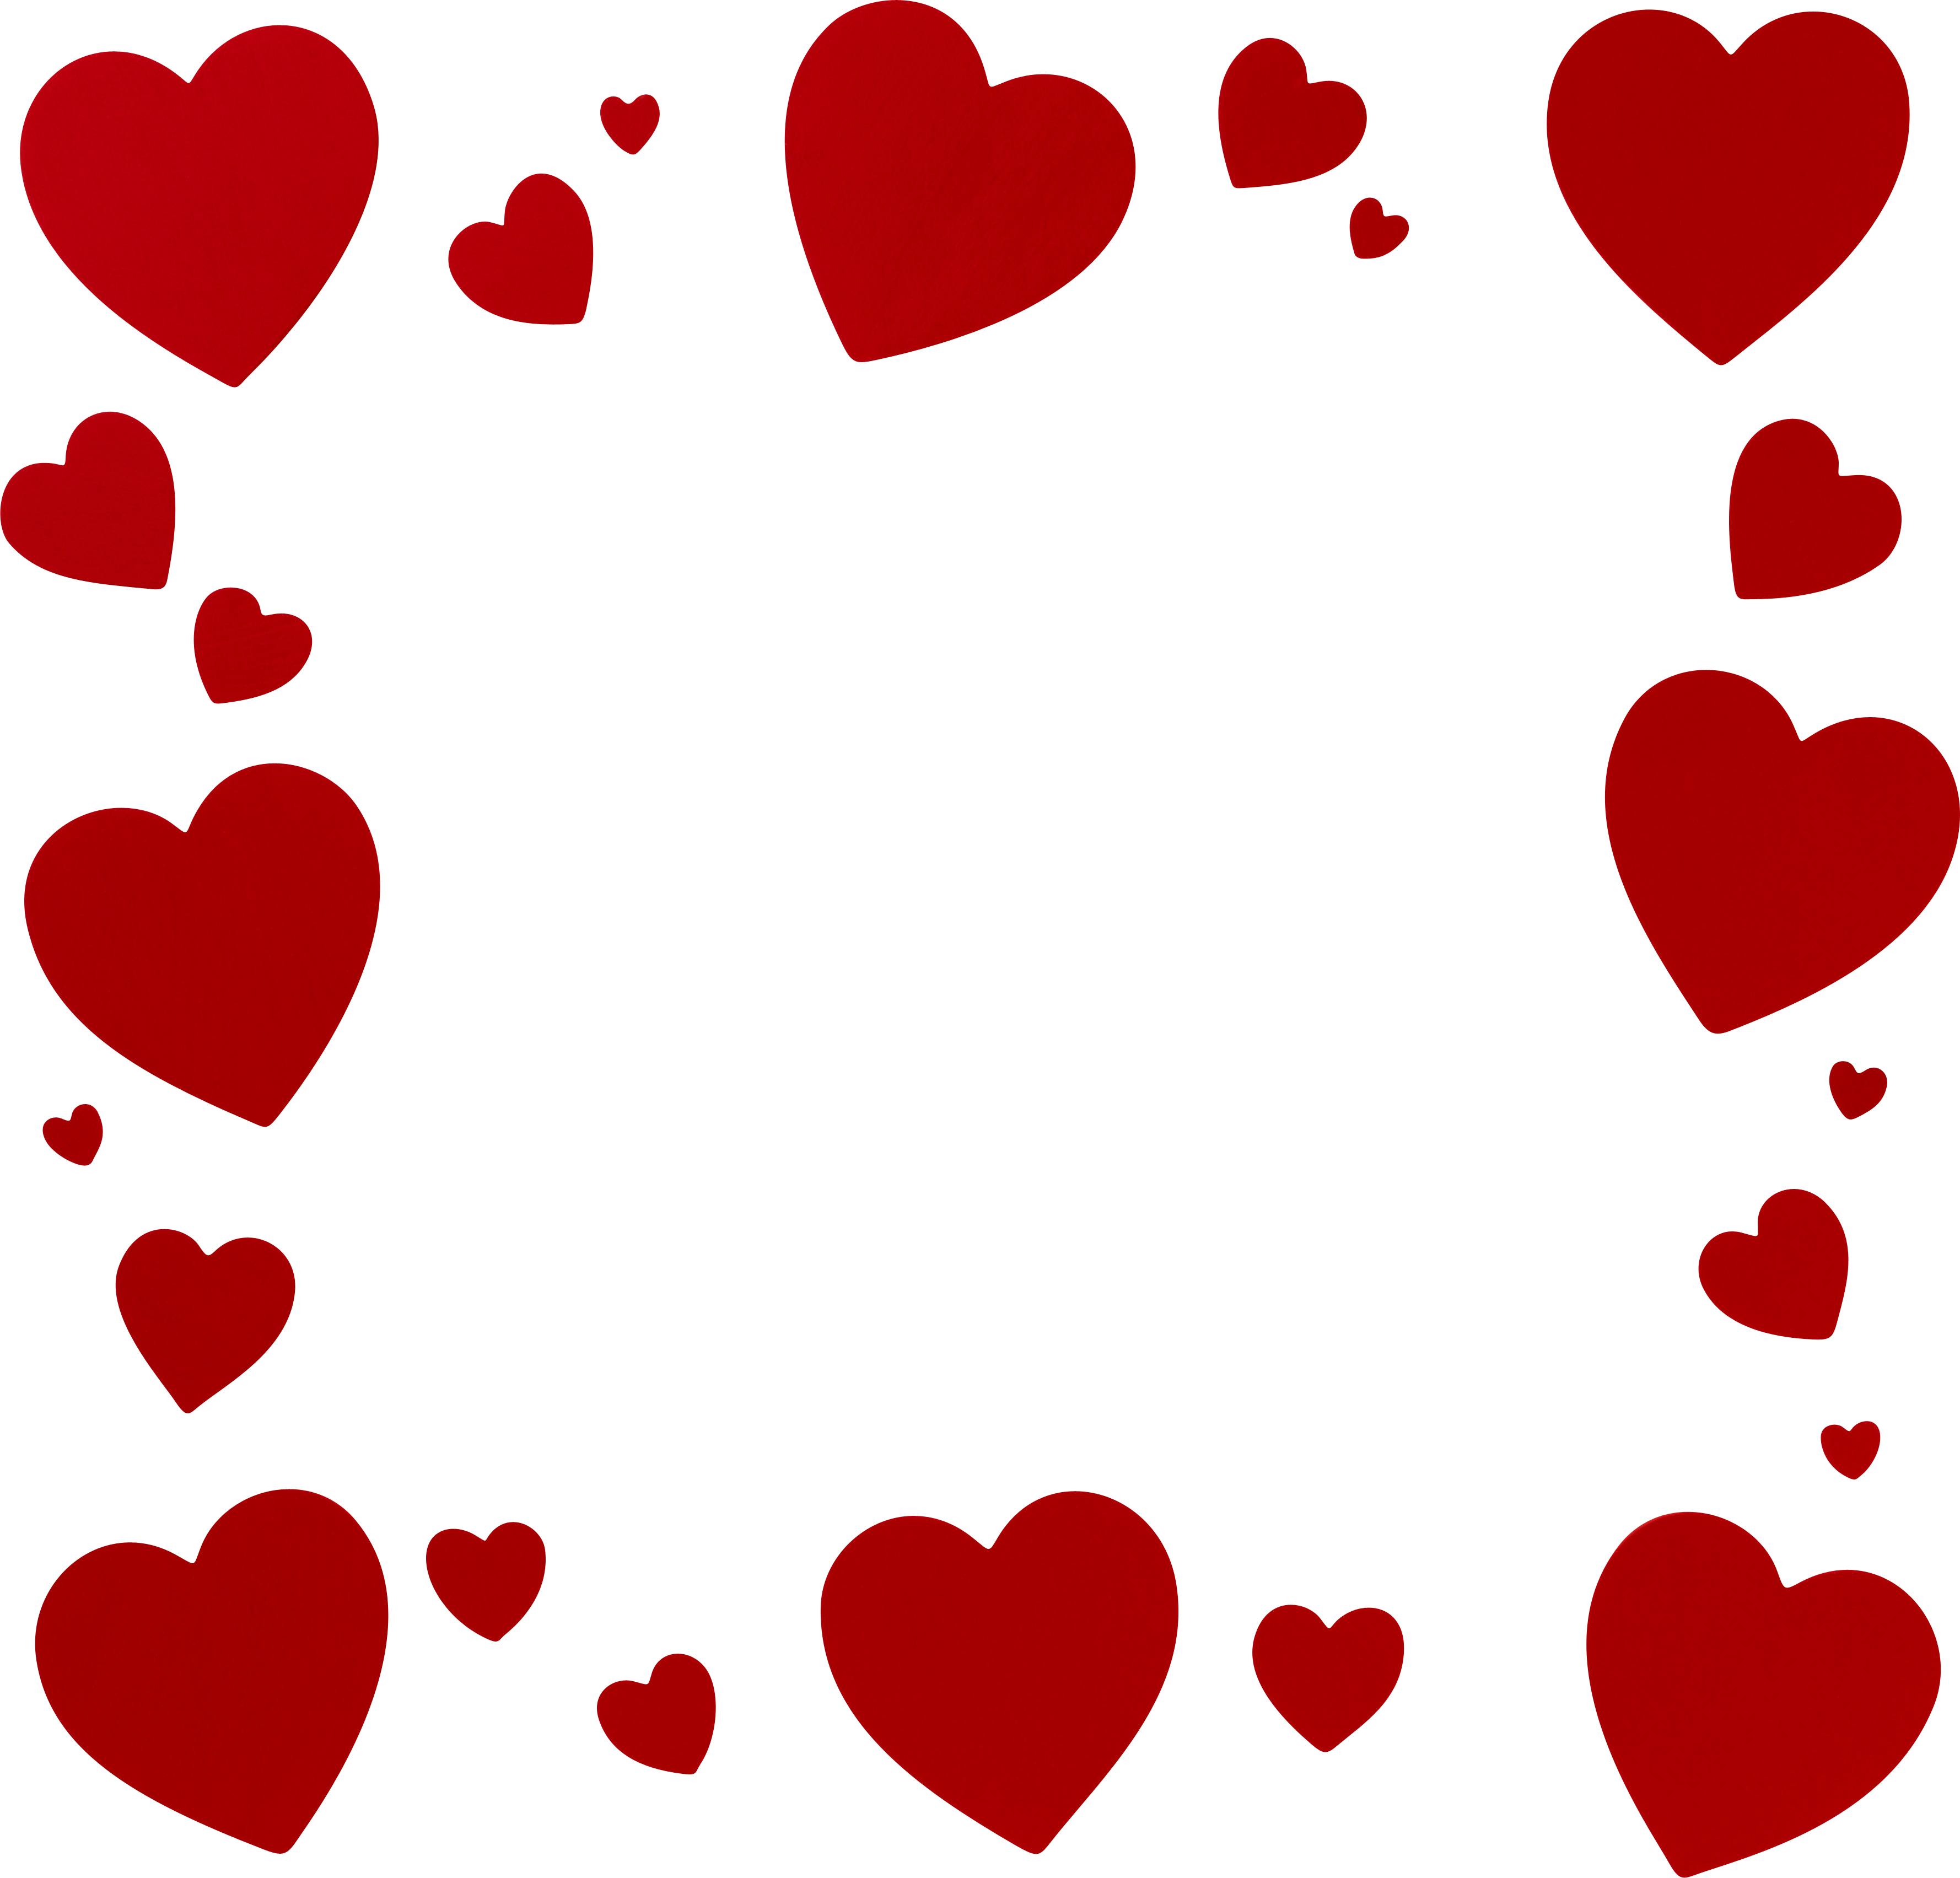 картинки рамочки из сердец является